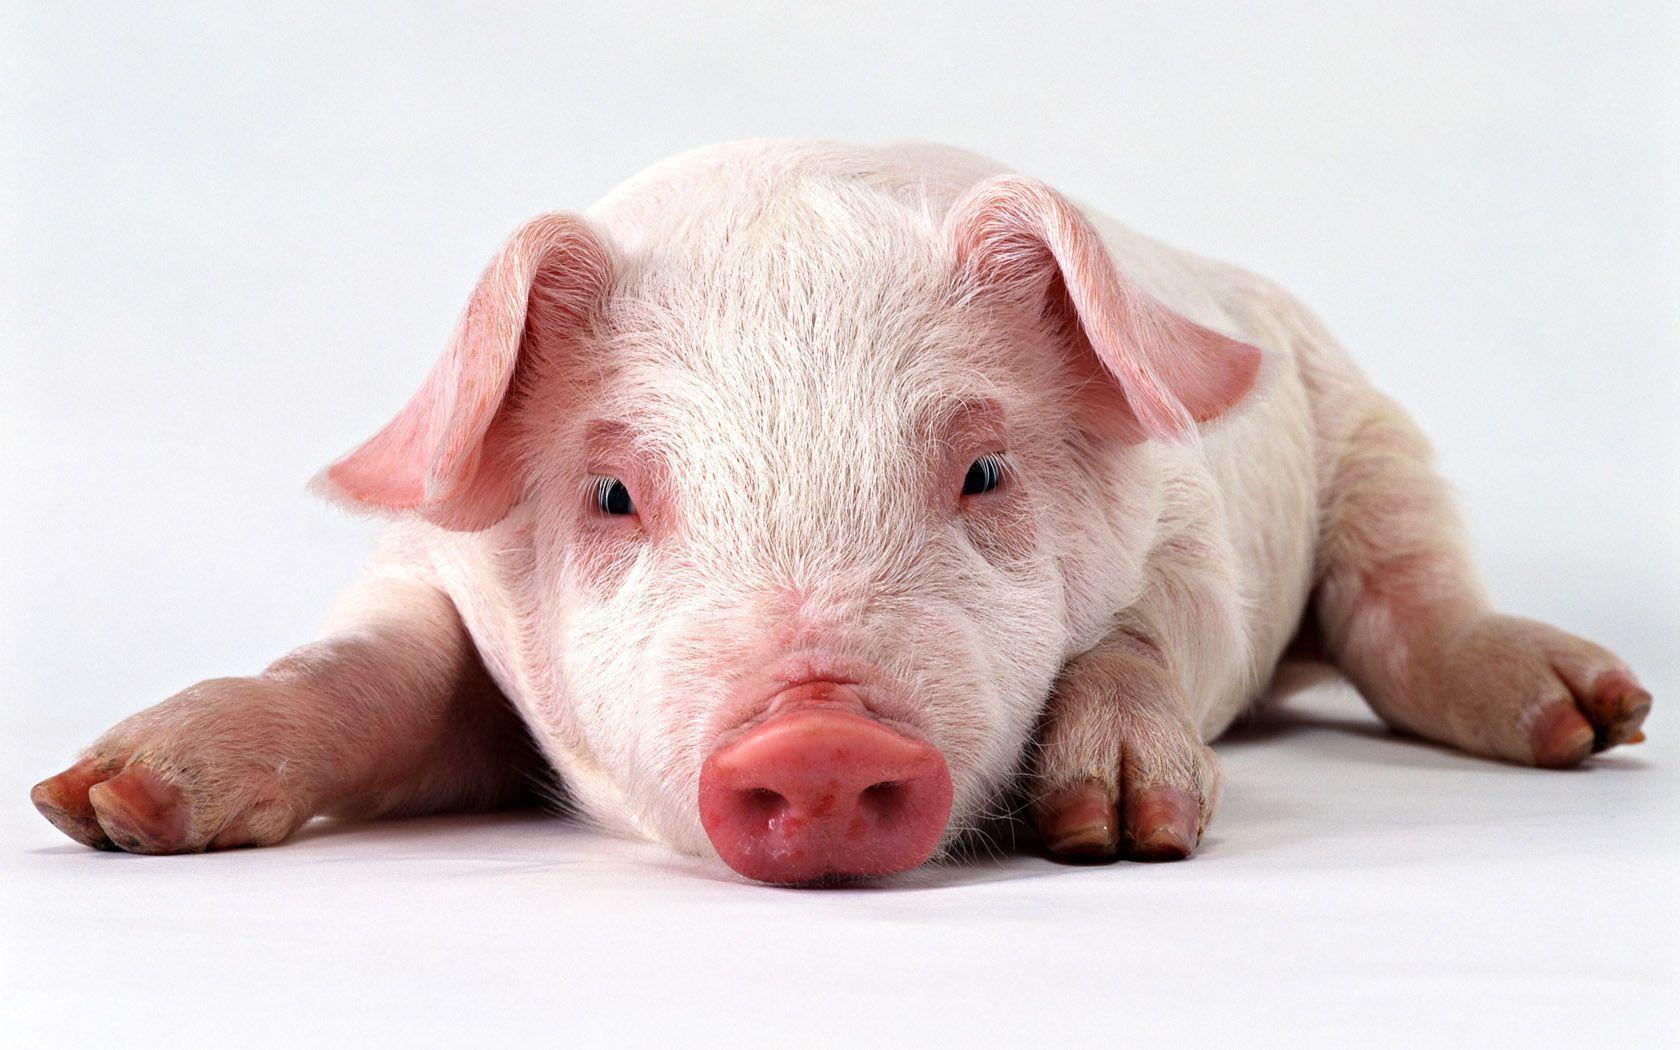 pig cute wallpapers pigs porc si piggy piglet adorable very